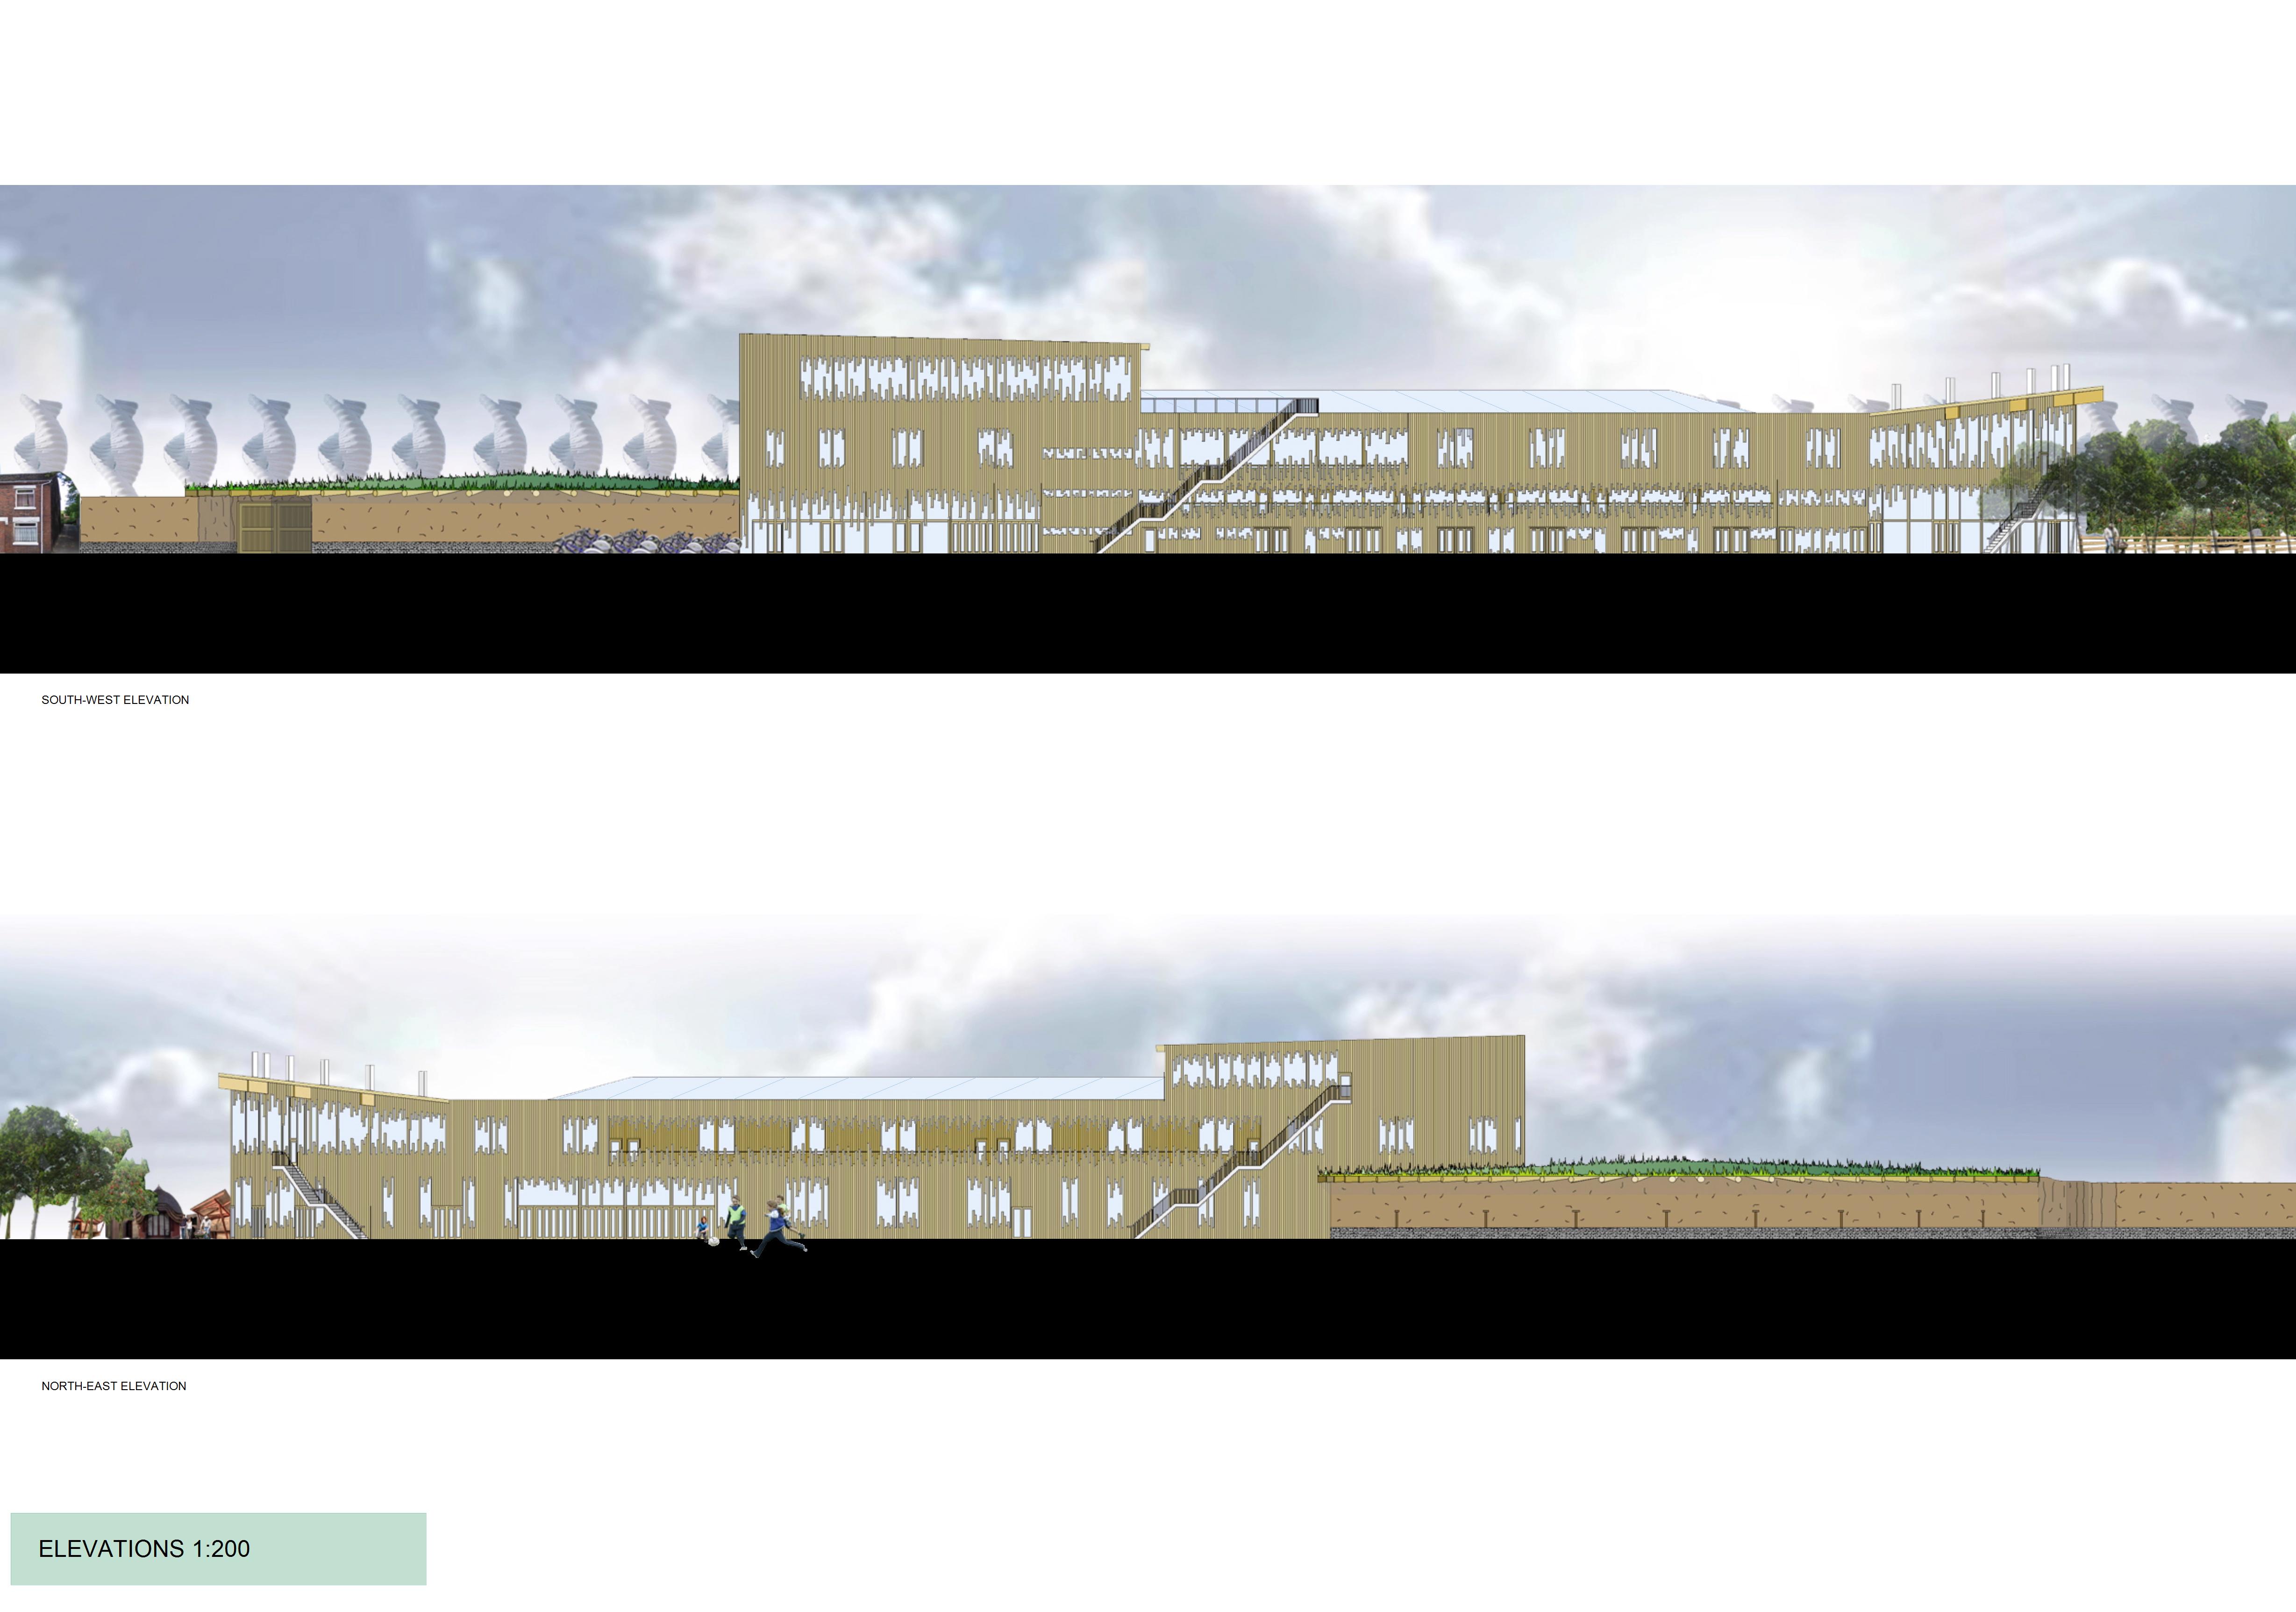 Stoke Sustainability College Elevations 1